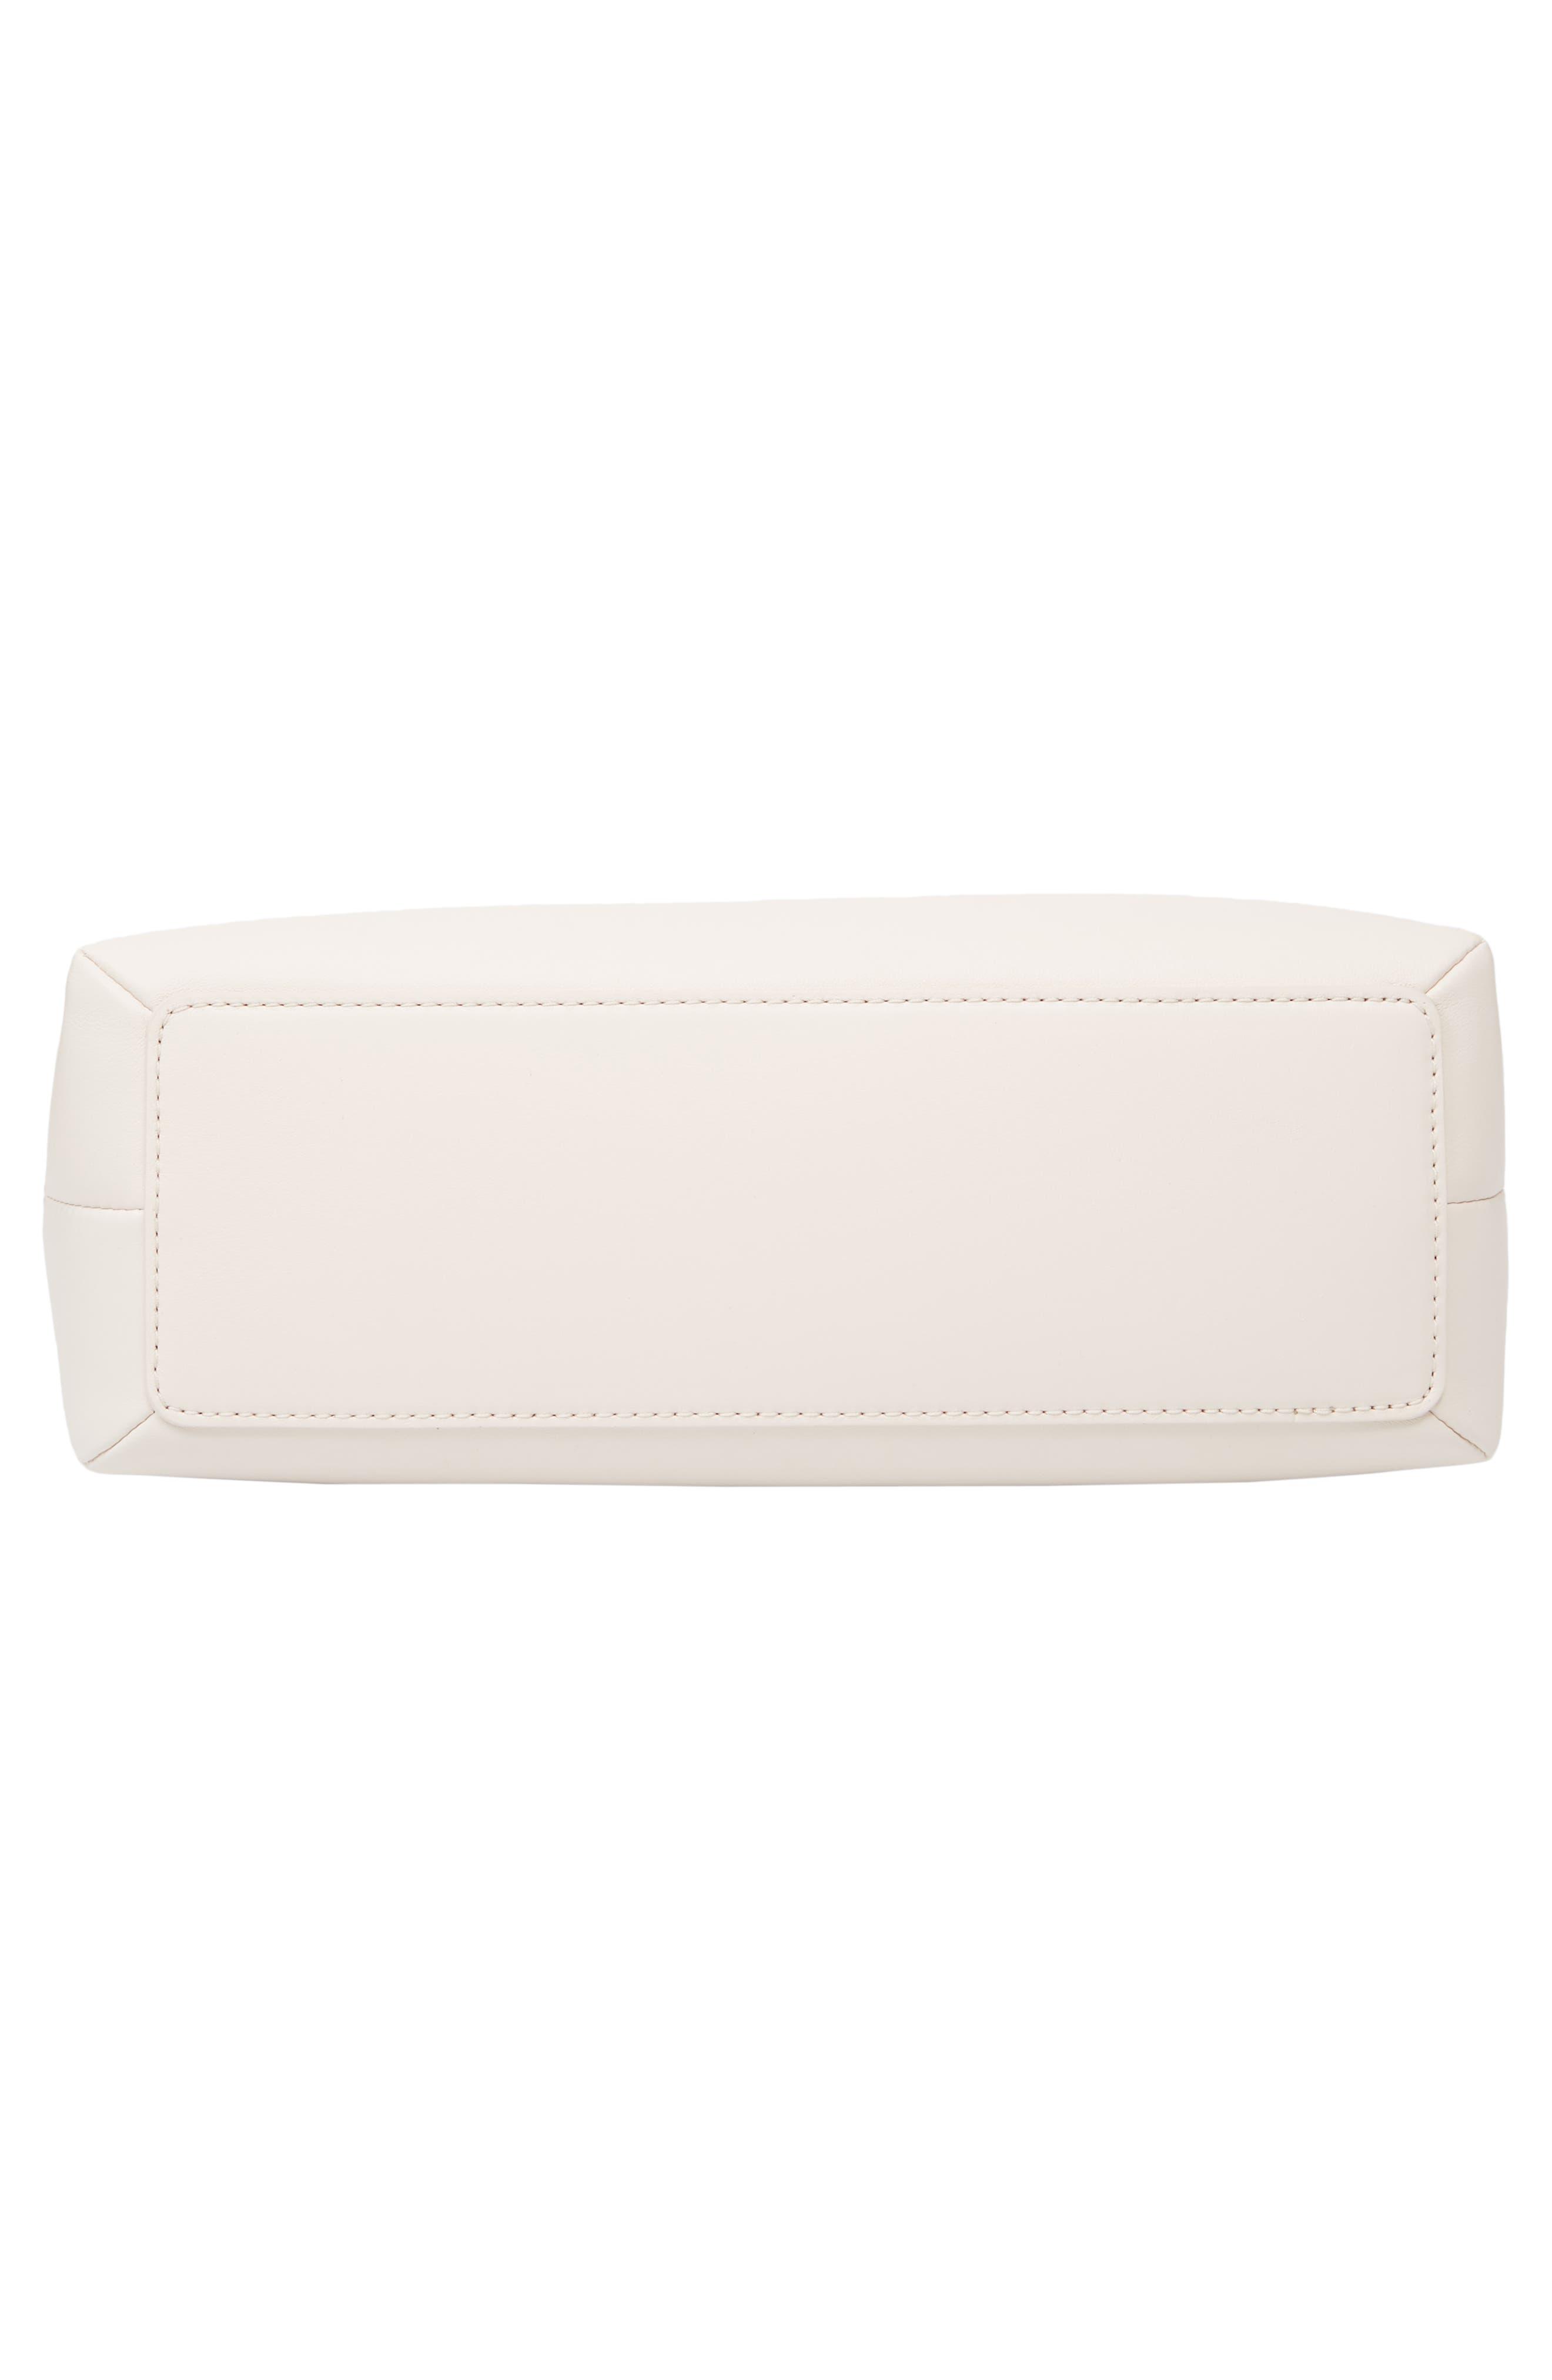 emerson place lorie quilted leather shoulder bag,                             Alternate thumbnail 6, color,                             BLEACH BONE